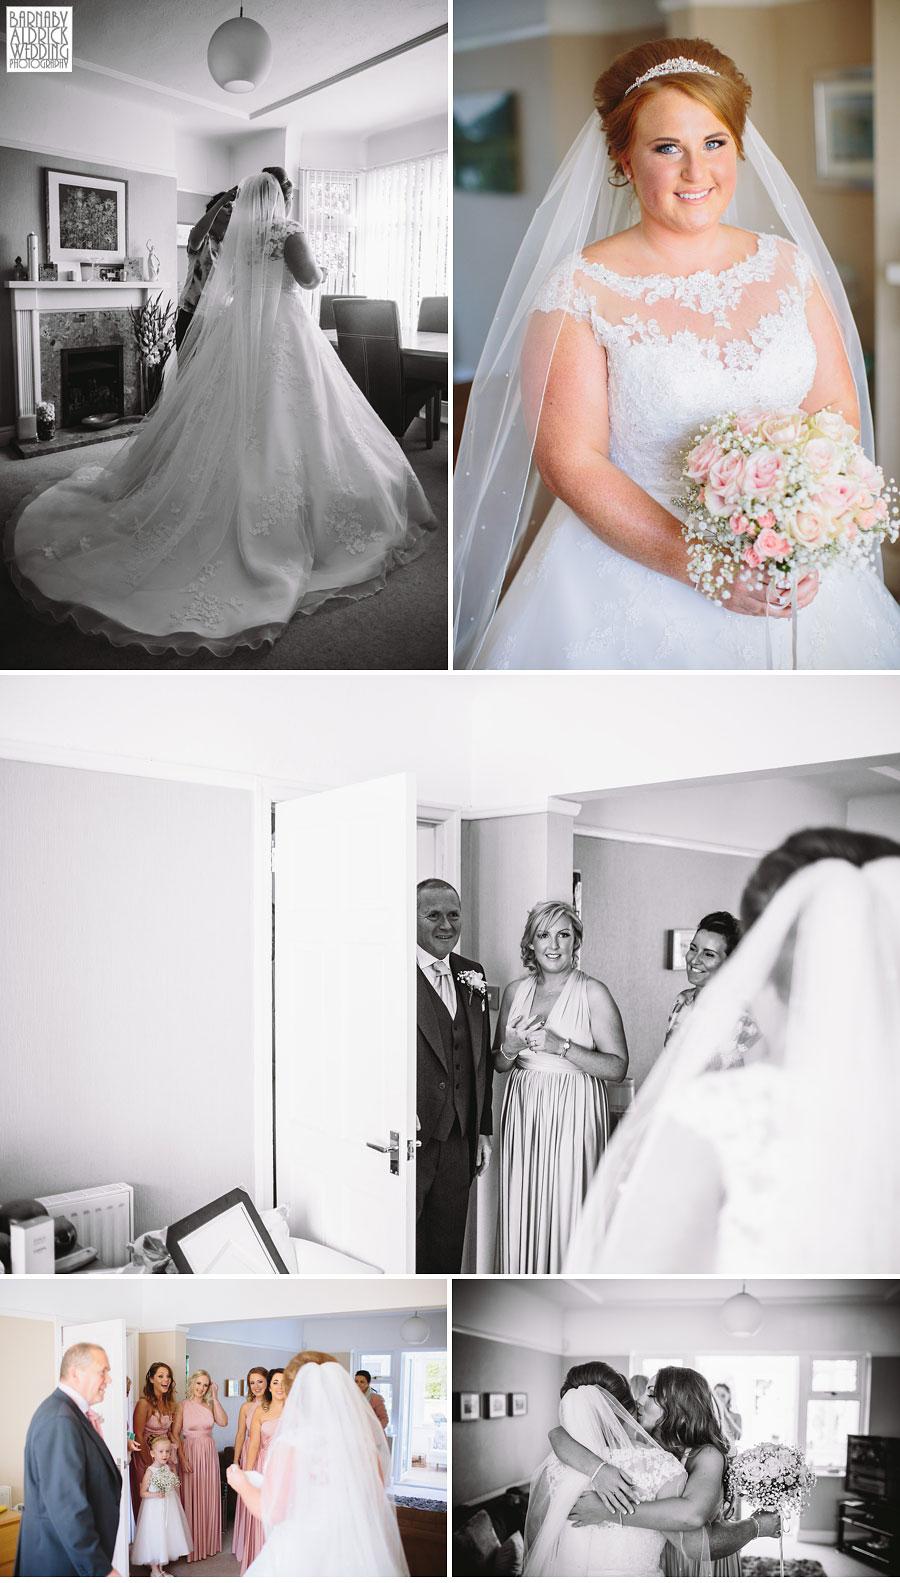 Hillbark Hotel The Wirral Wedding Photography 014